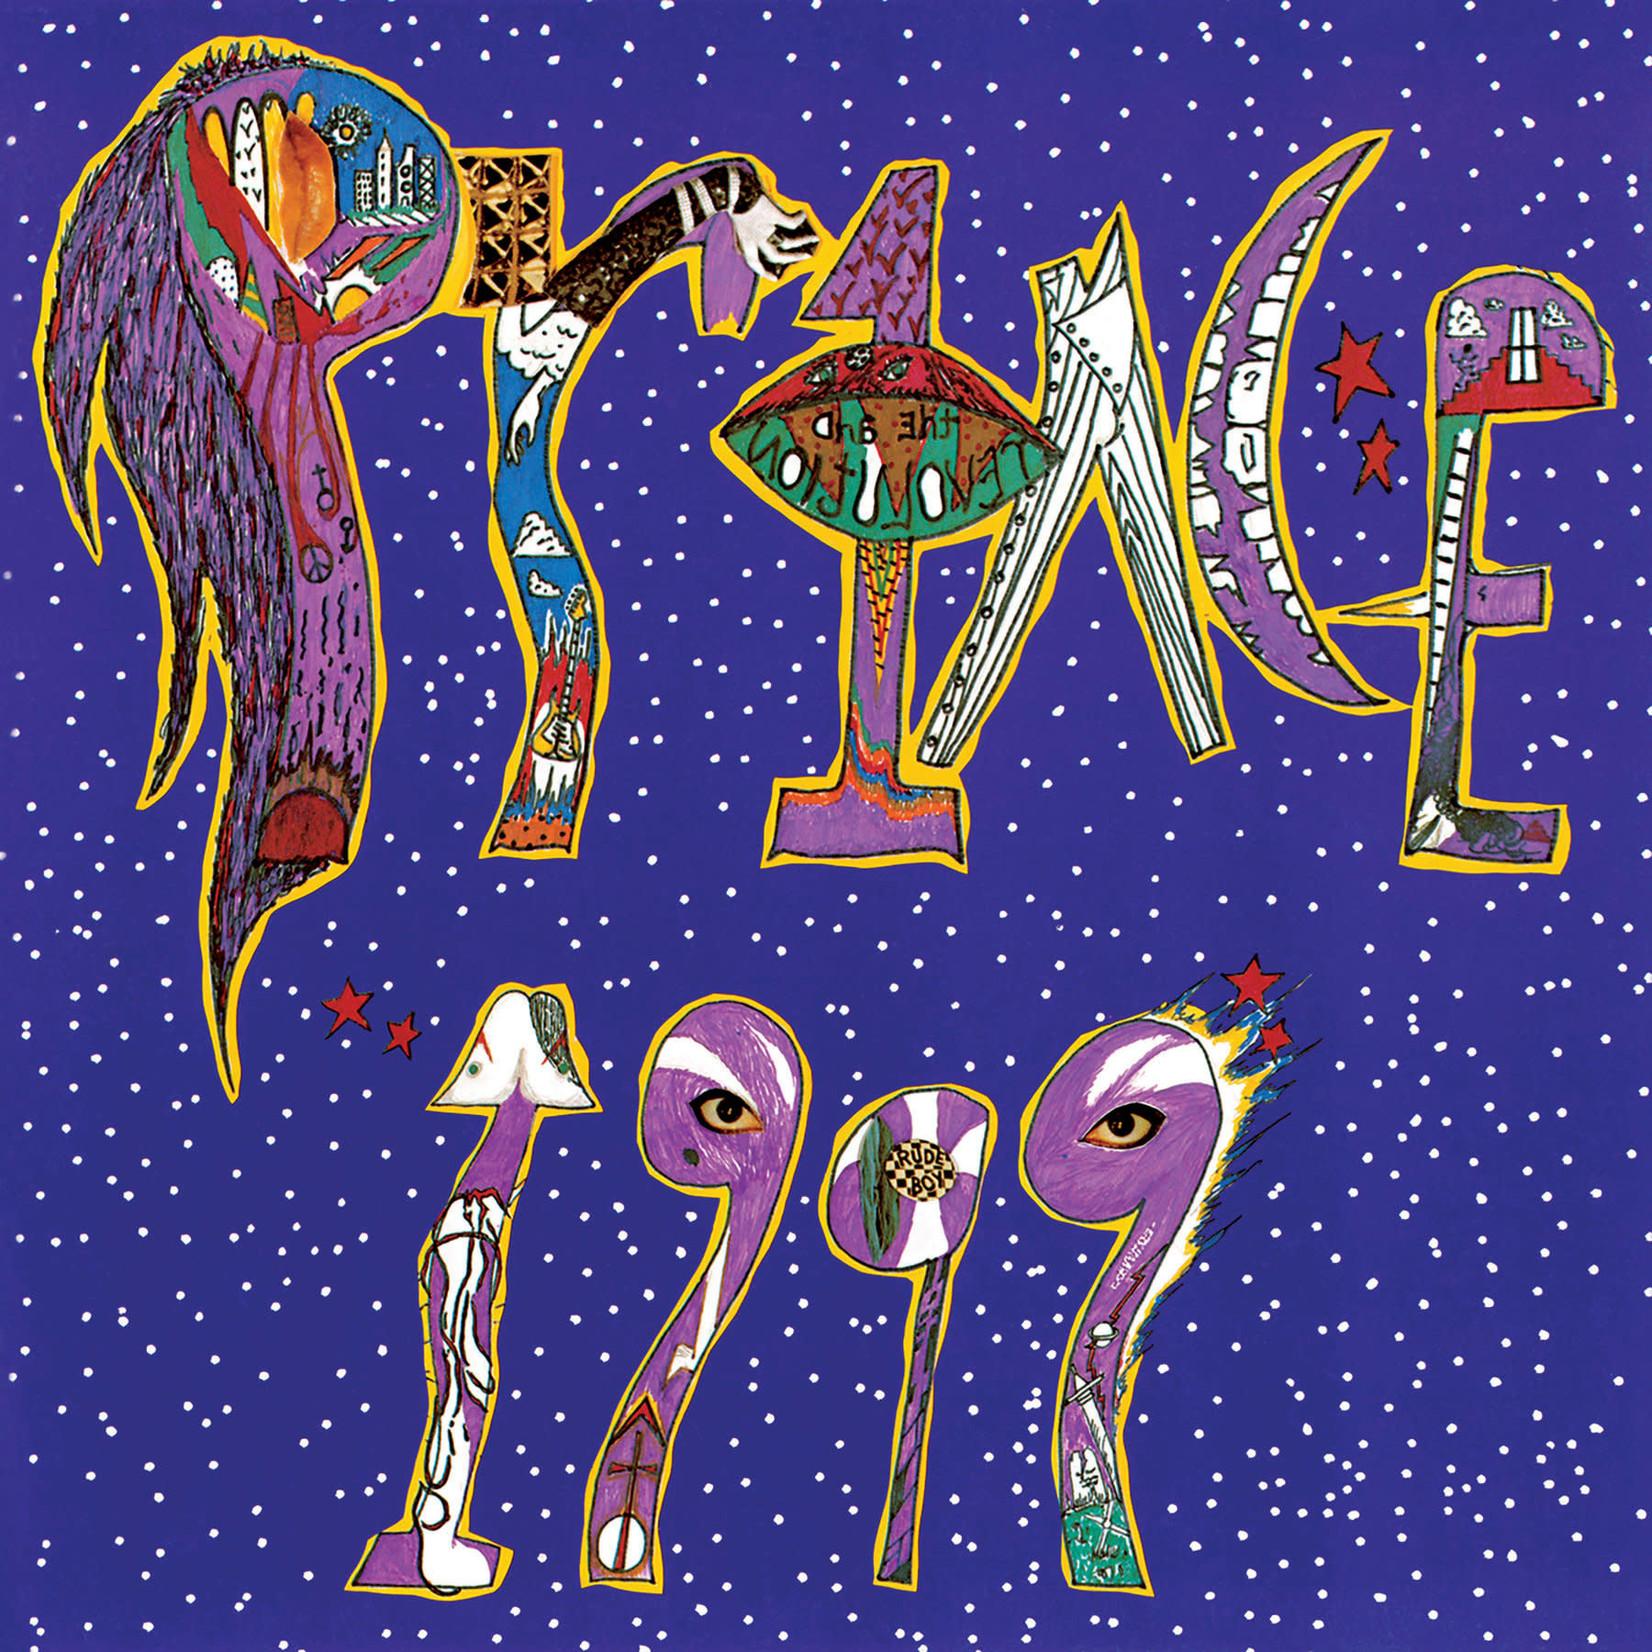 [Vintage] Prince: 1999 (2LP)